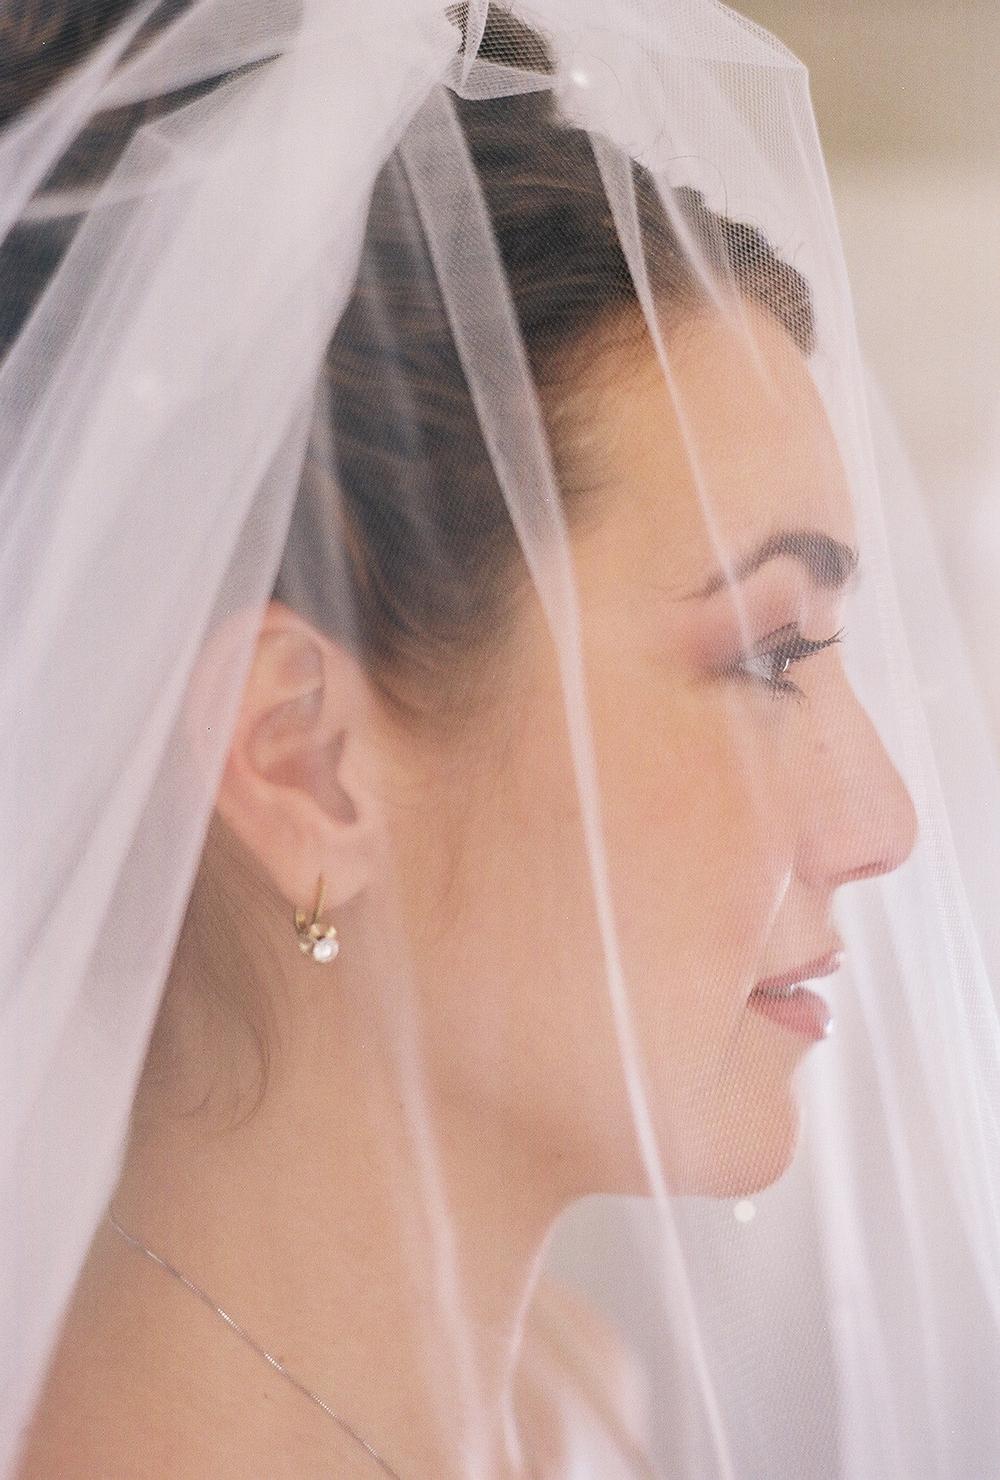 bride_close_portait.JPG